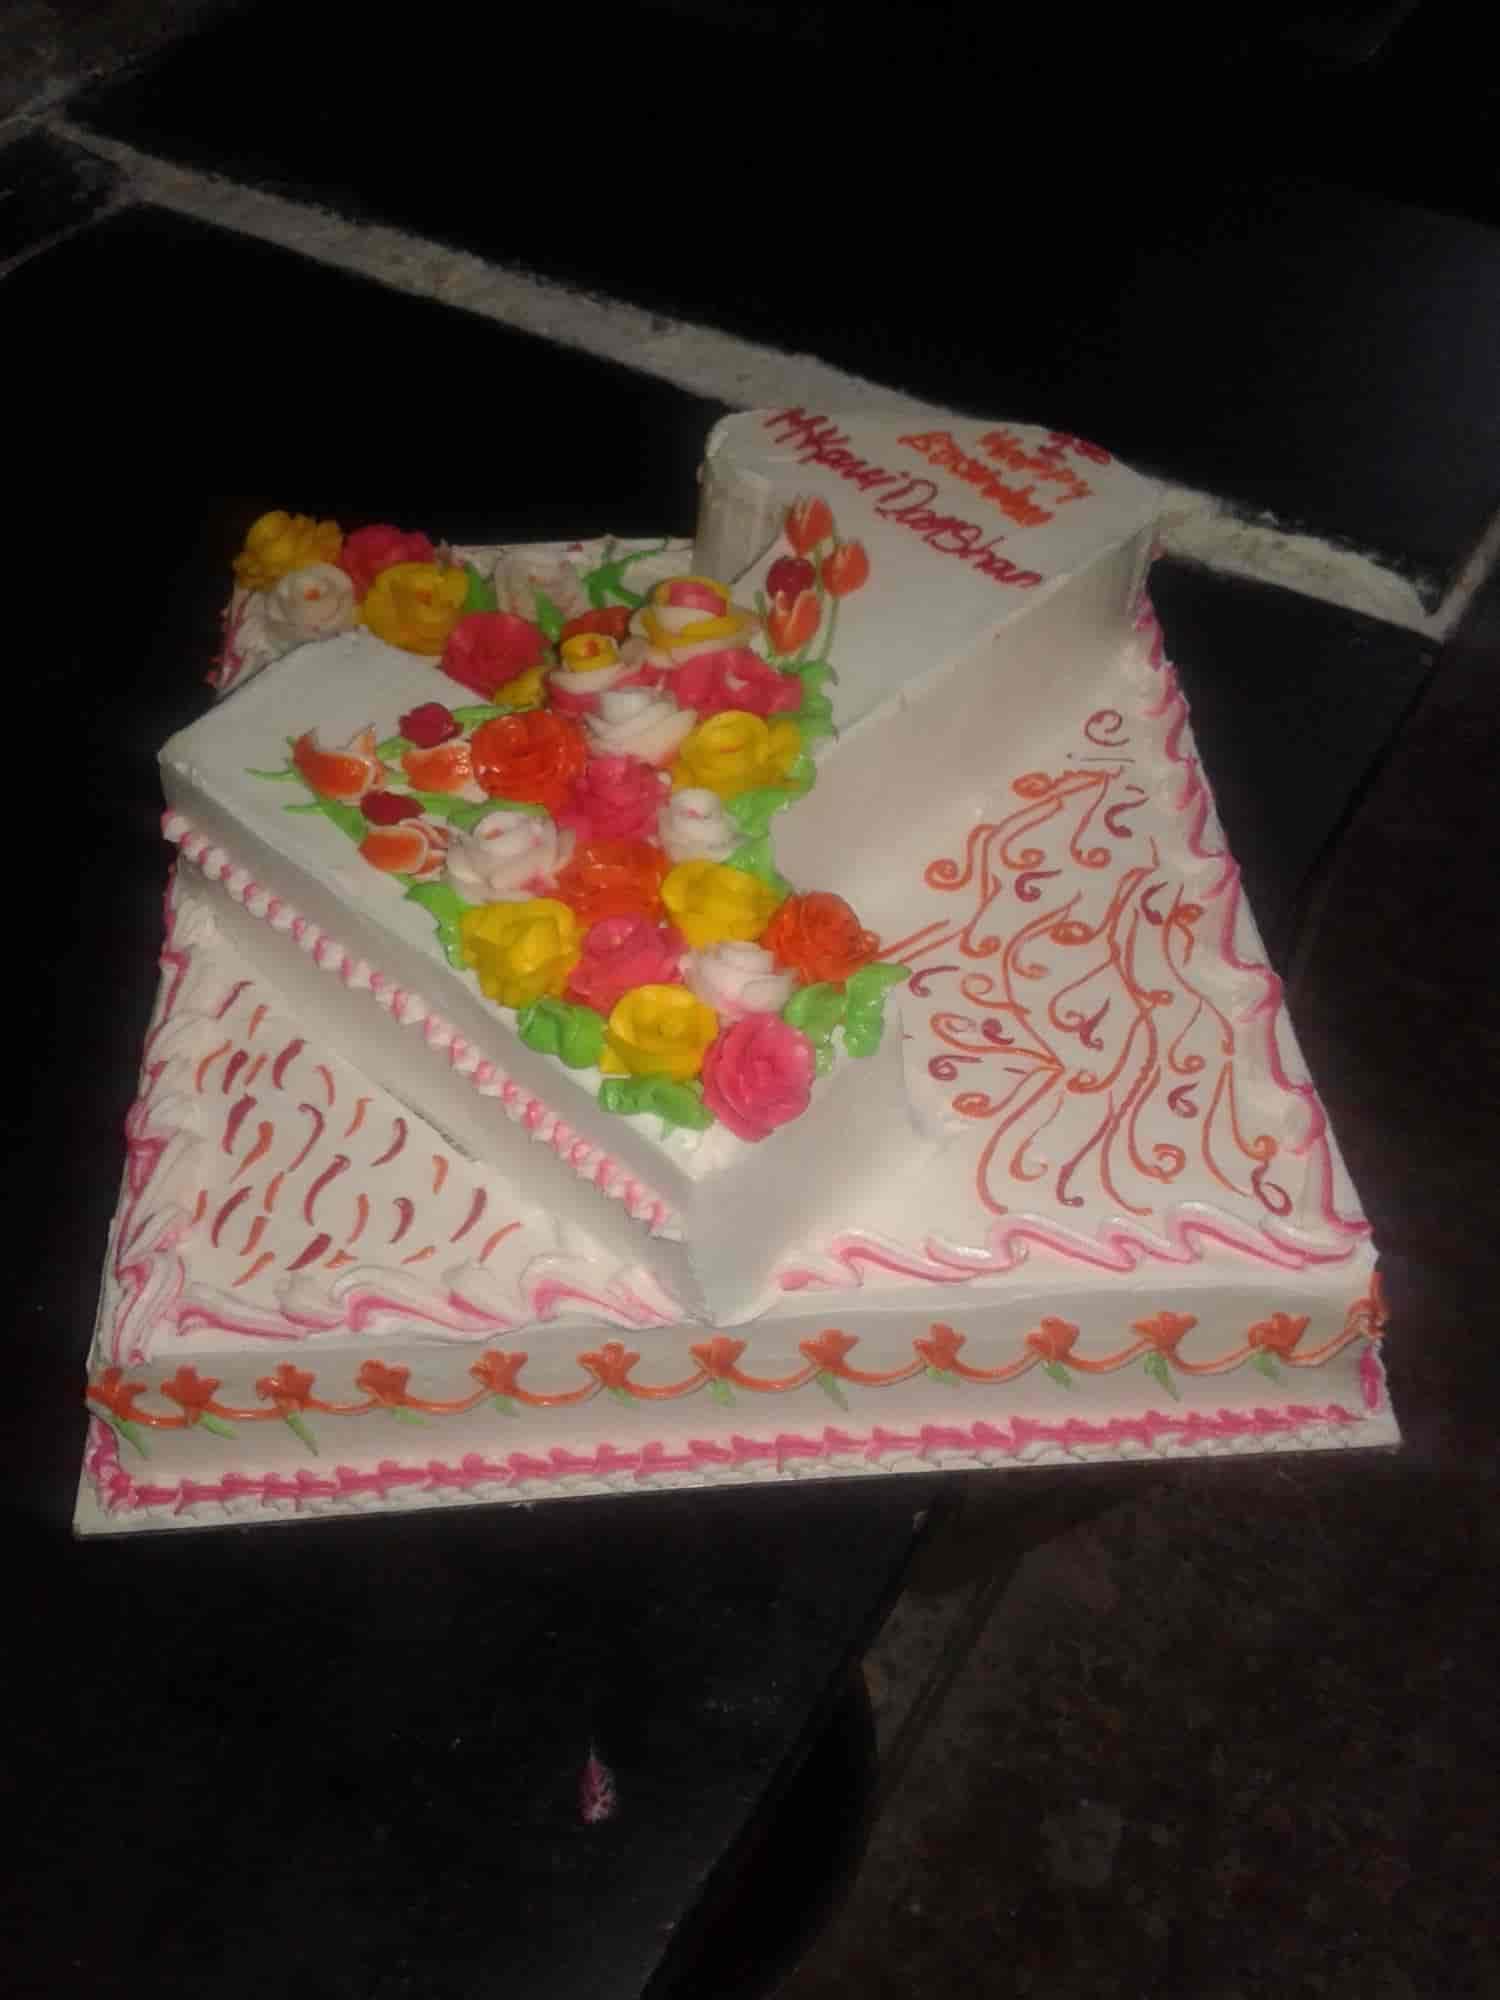 Vishu Bakery Arantangi Cake Shops In Pudukkottai Justdial